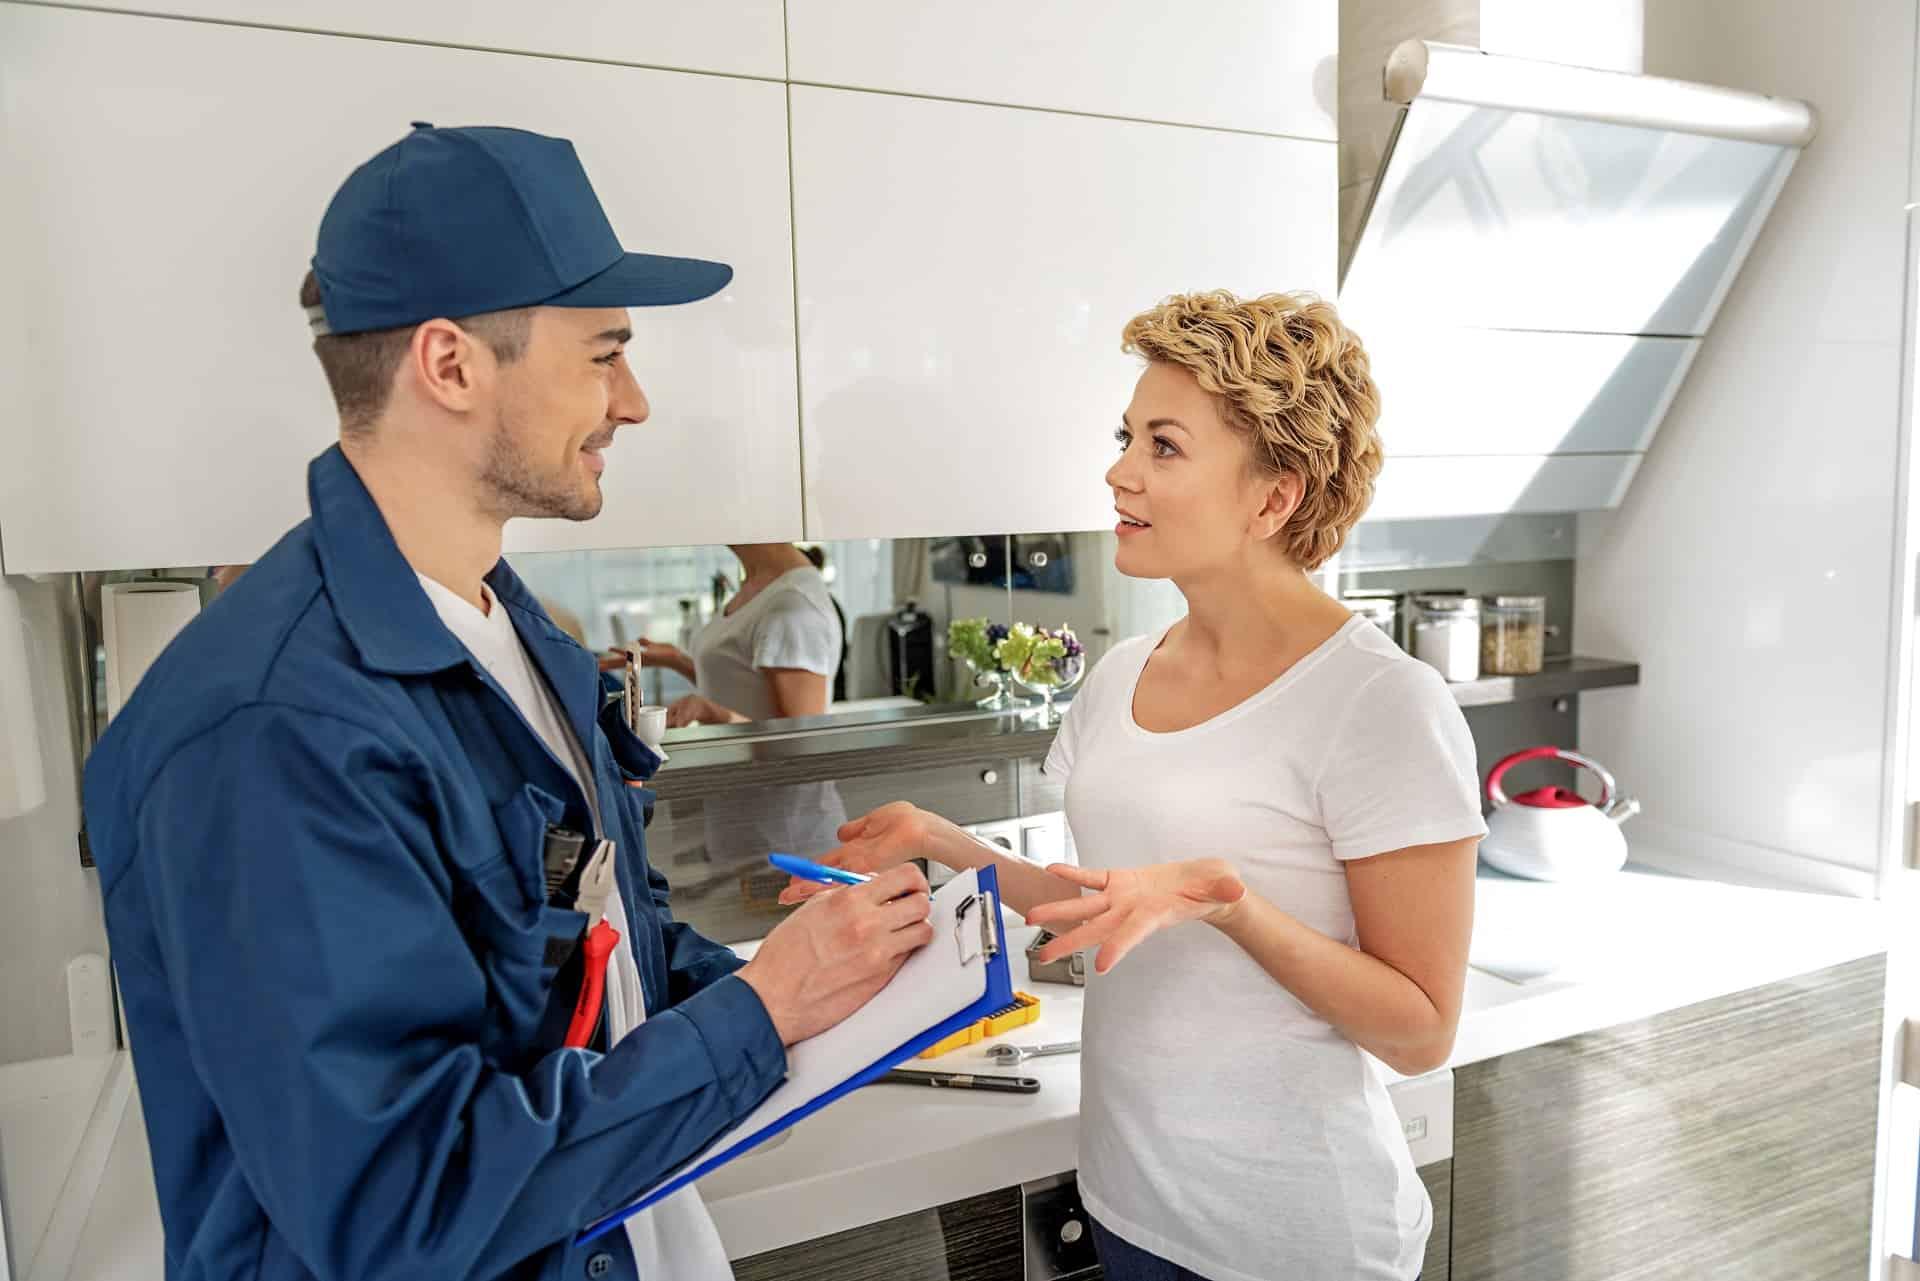 kitchen-repair-home-maintenance-expenses-tax-deductions-C4U-Inspections.